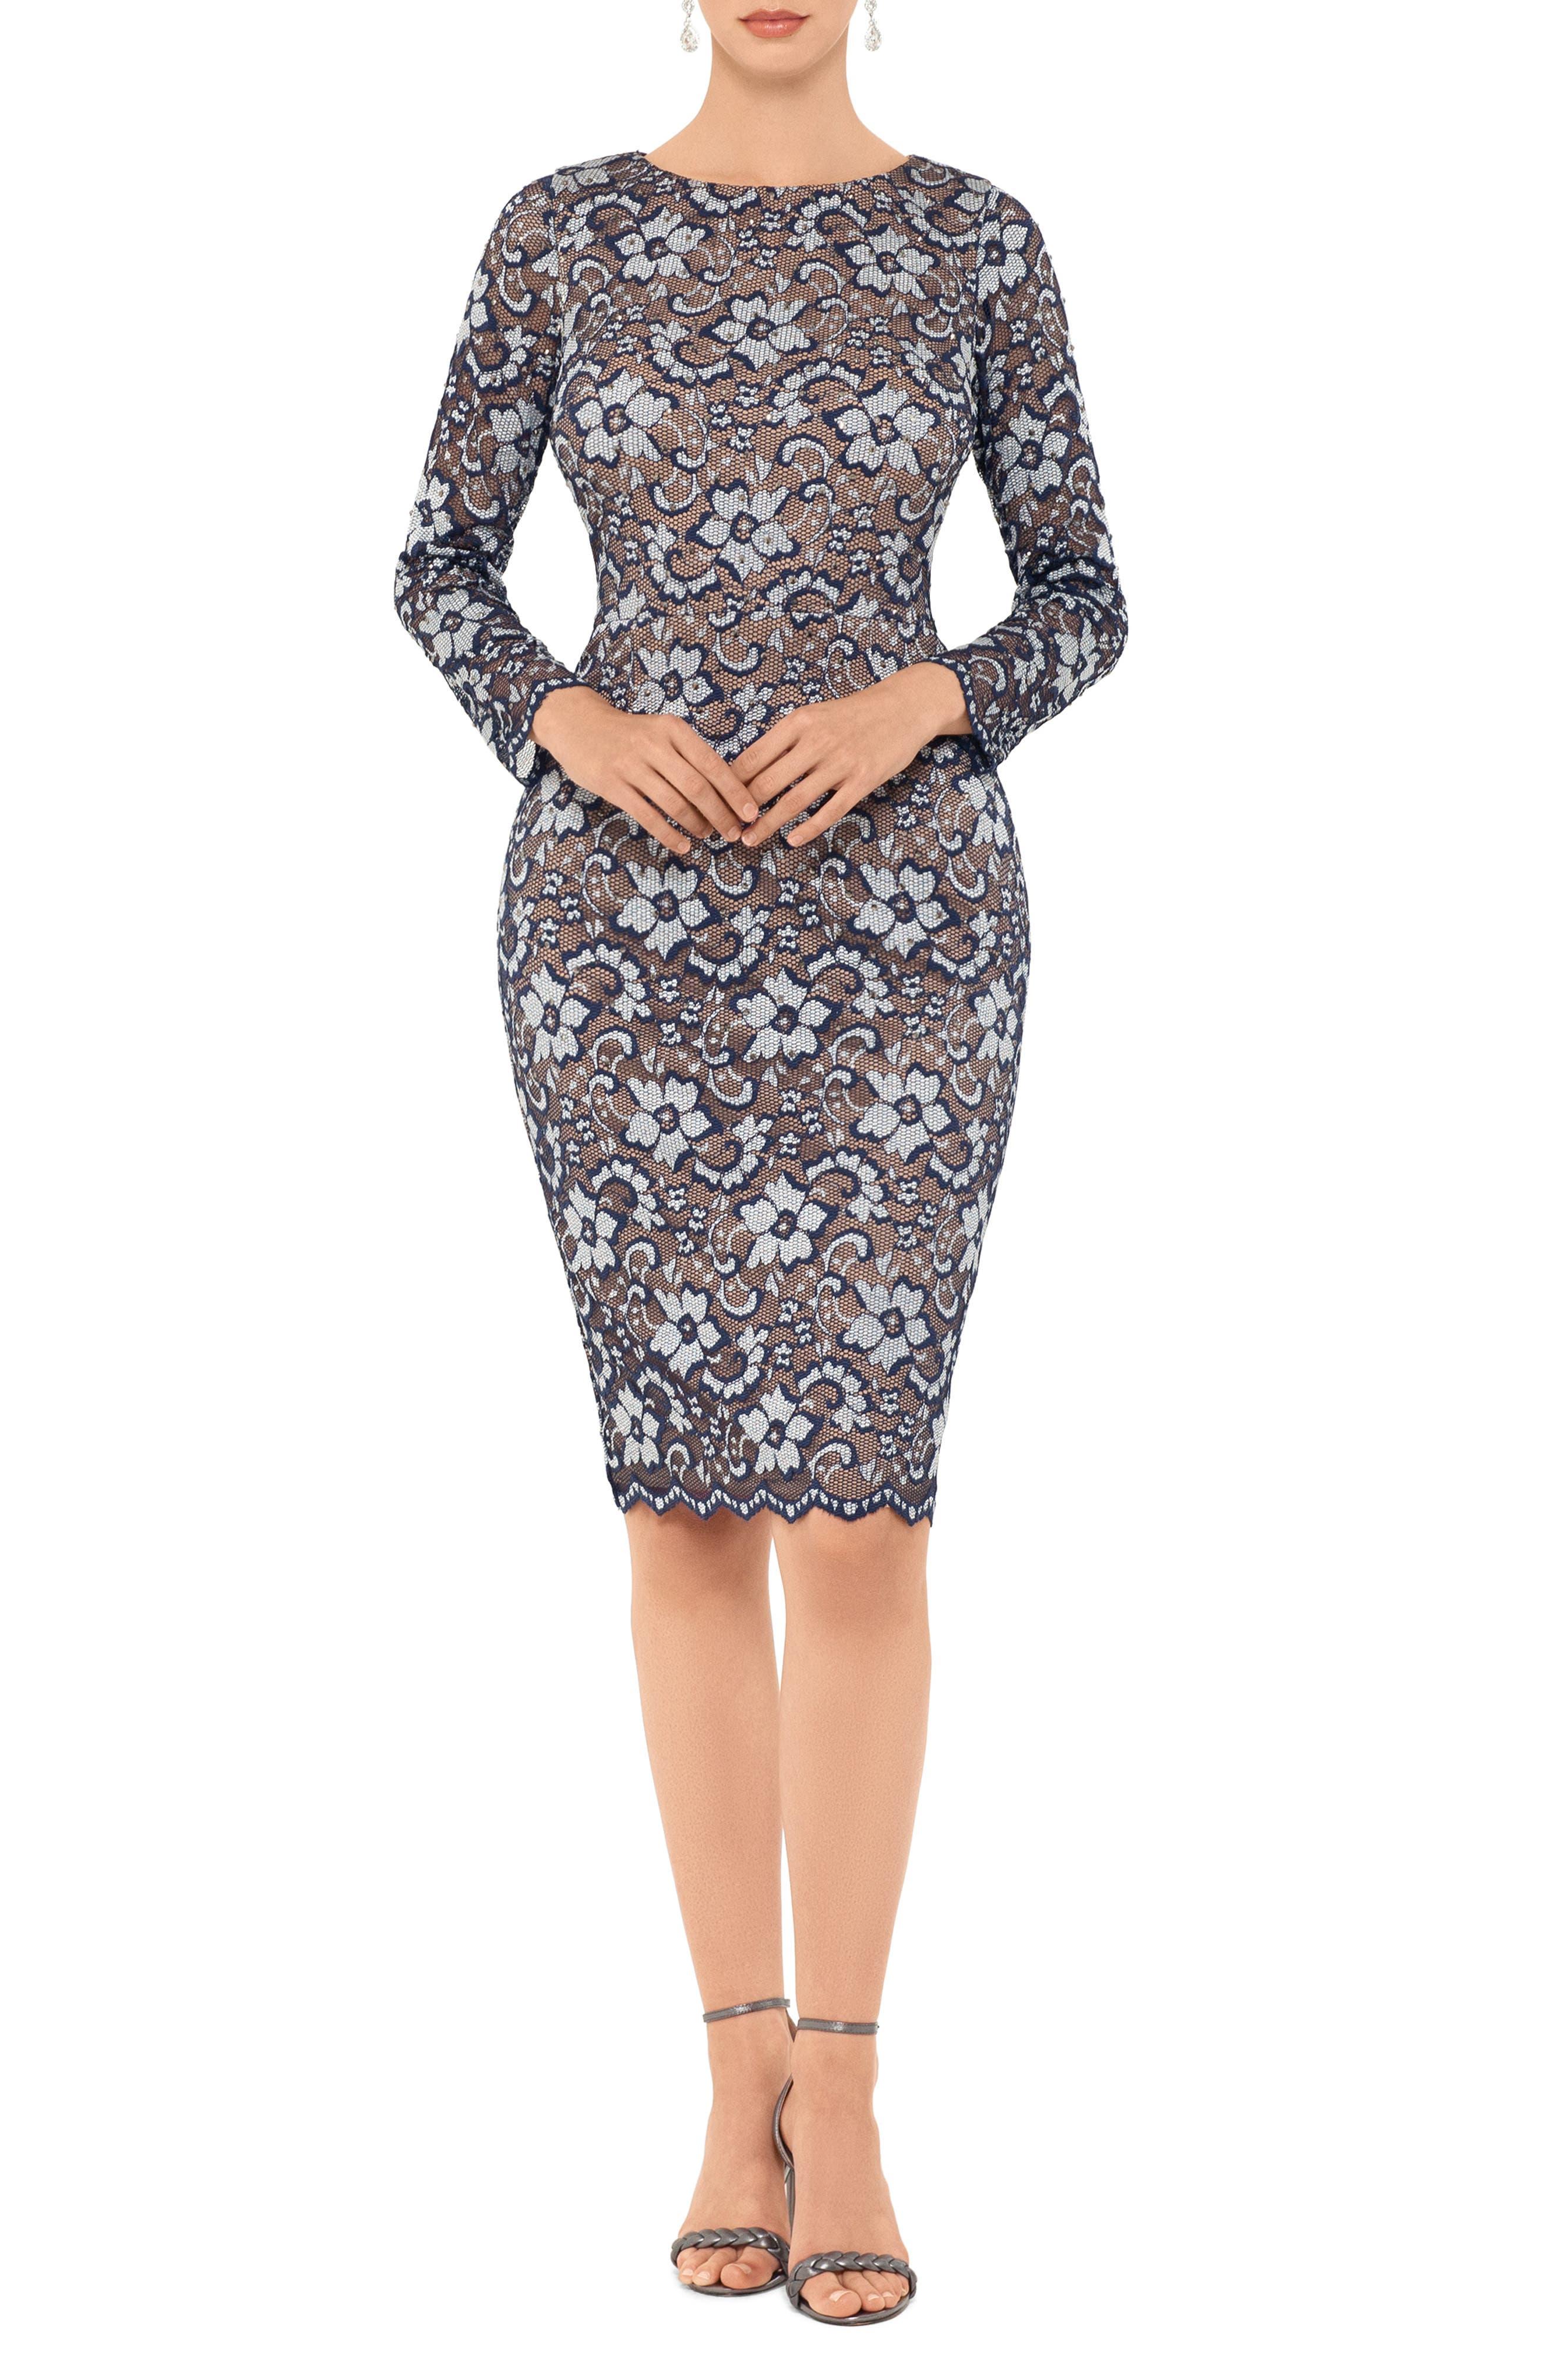 Xscape Two-Tone Floral Lace Long Sleeve Cocktail Dress, Blue